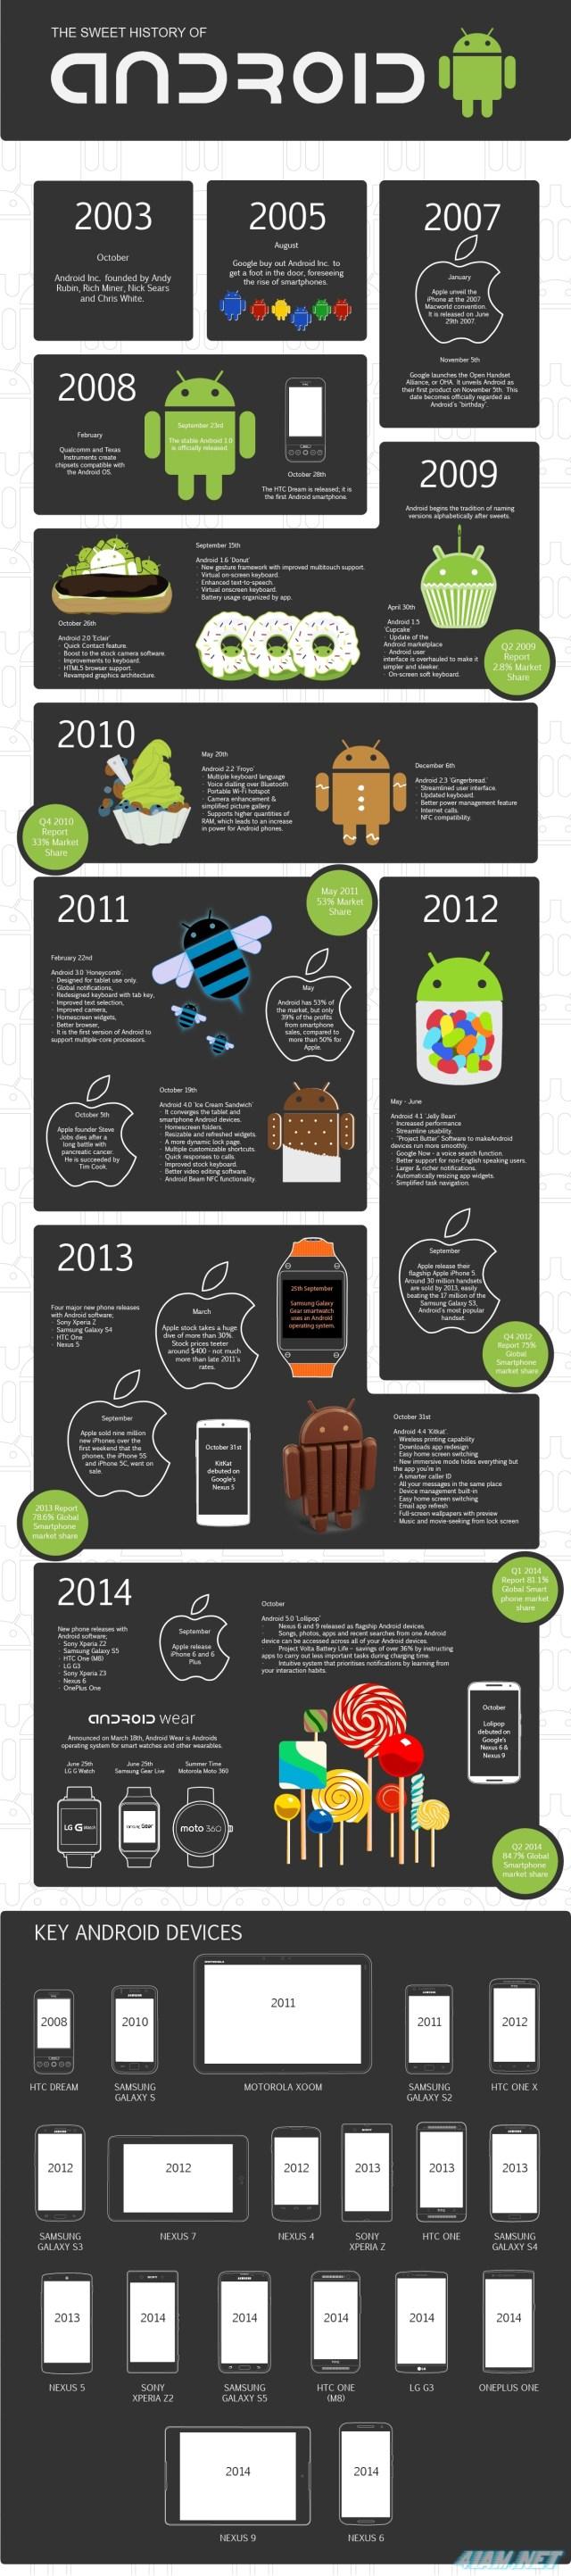 Google, Android, History, Story, Андроид, История, Инфографика